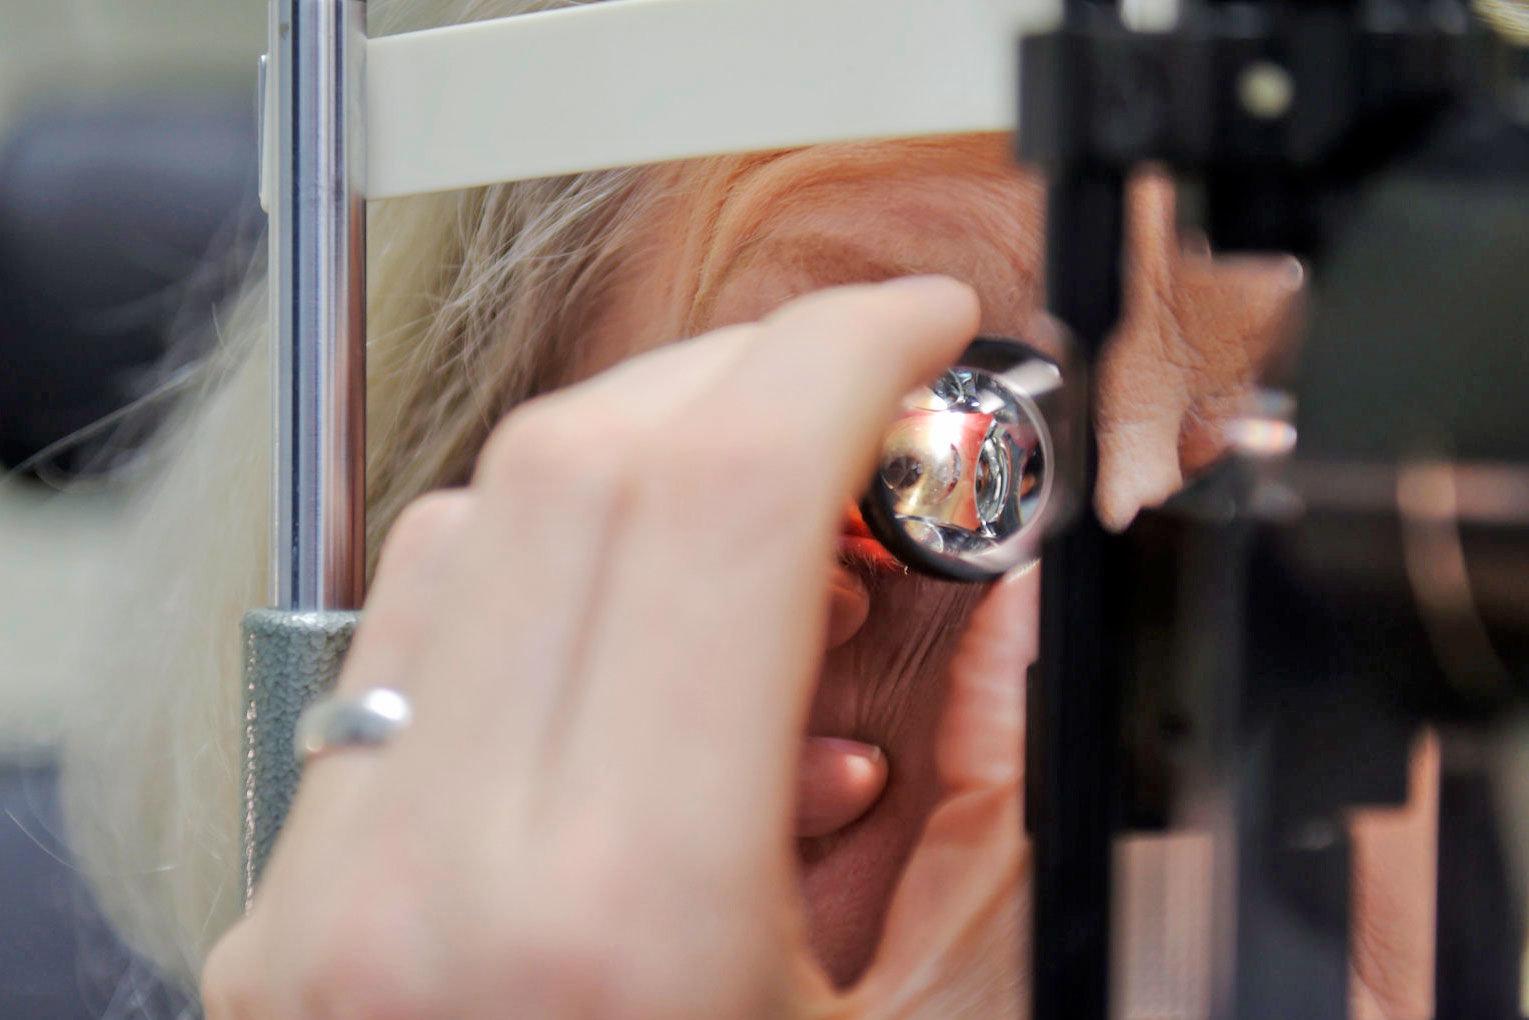 Impianto glaucoma